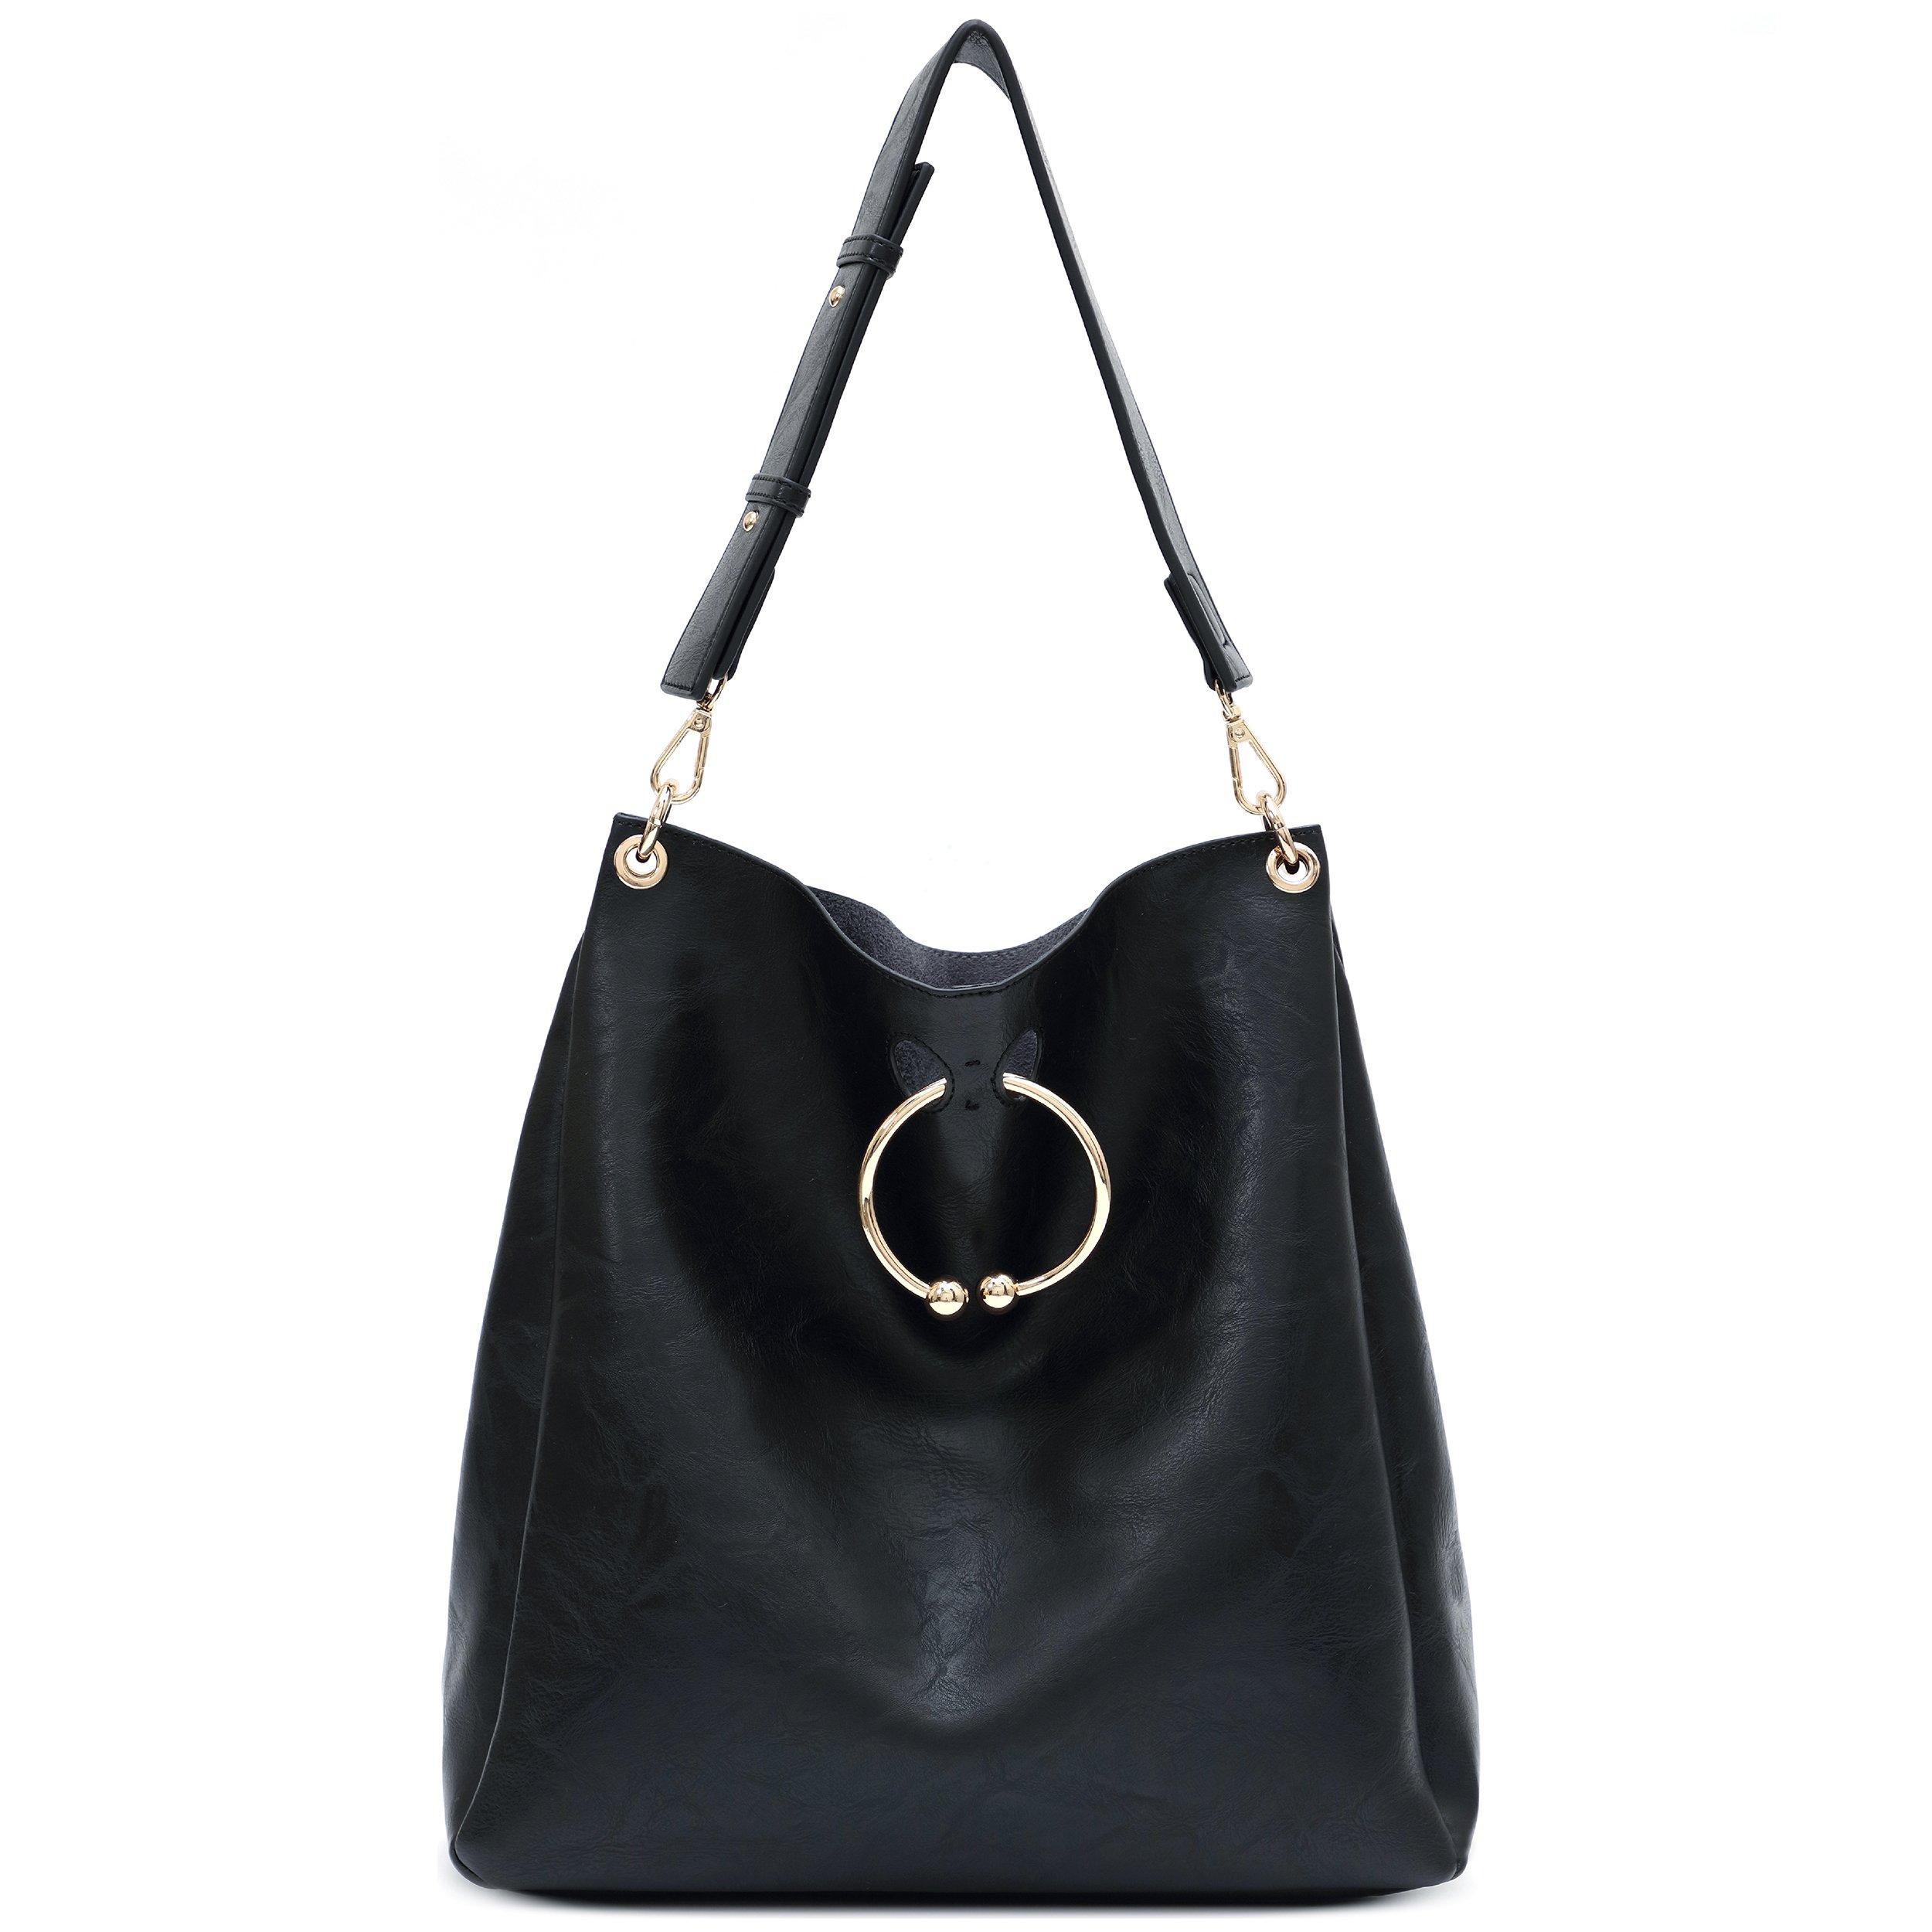 Yojoy Women's Soft Faux Leather Hobo Handbags Ladies Shoulder Bag Tote Purse (Black)